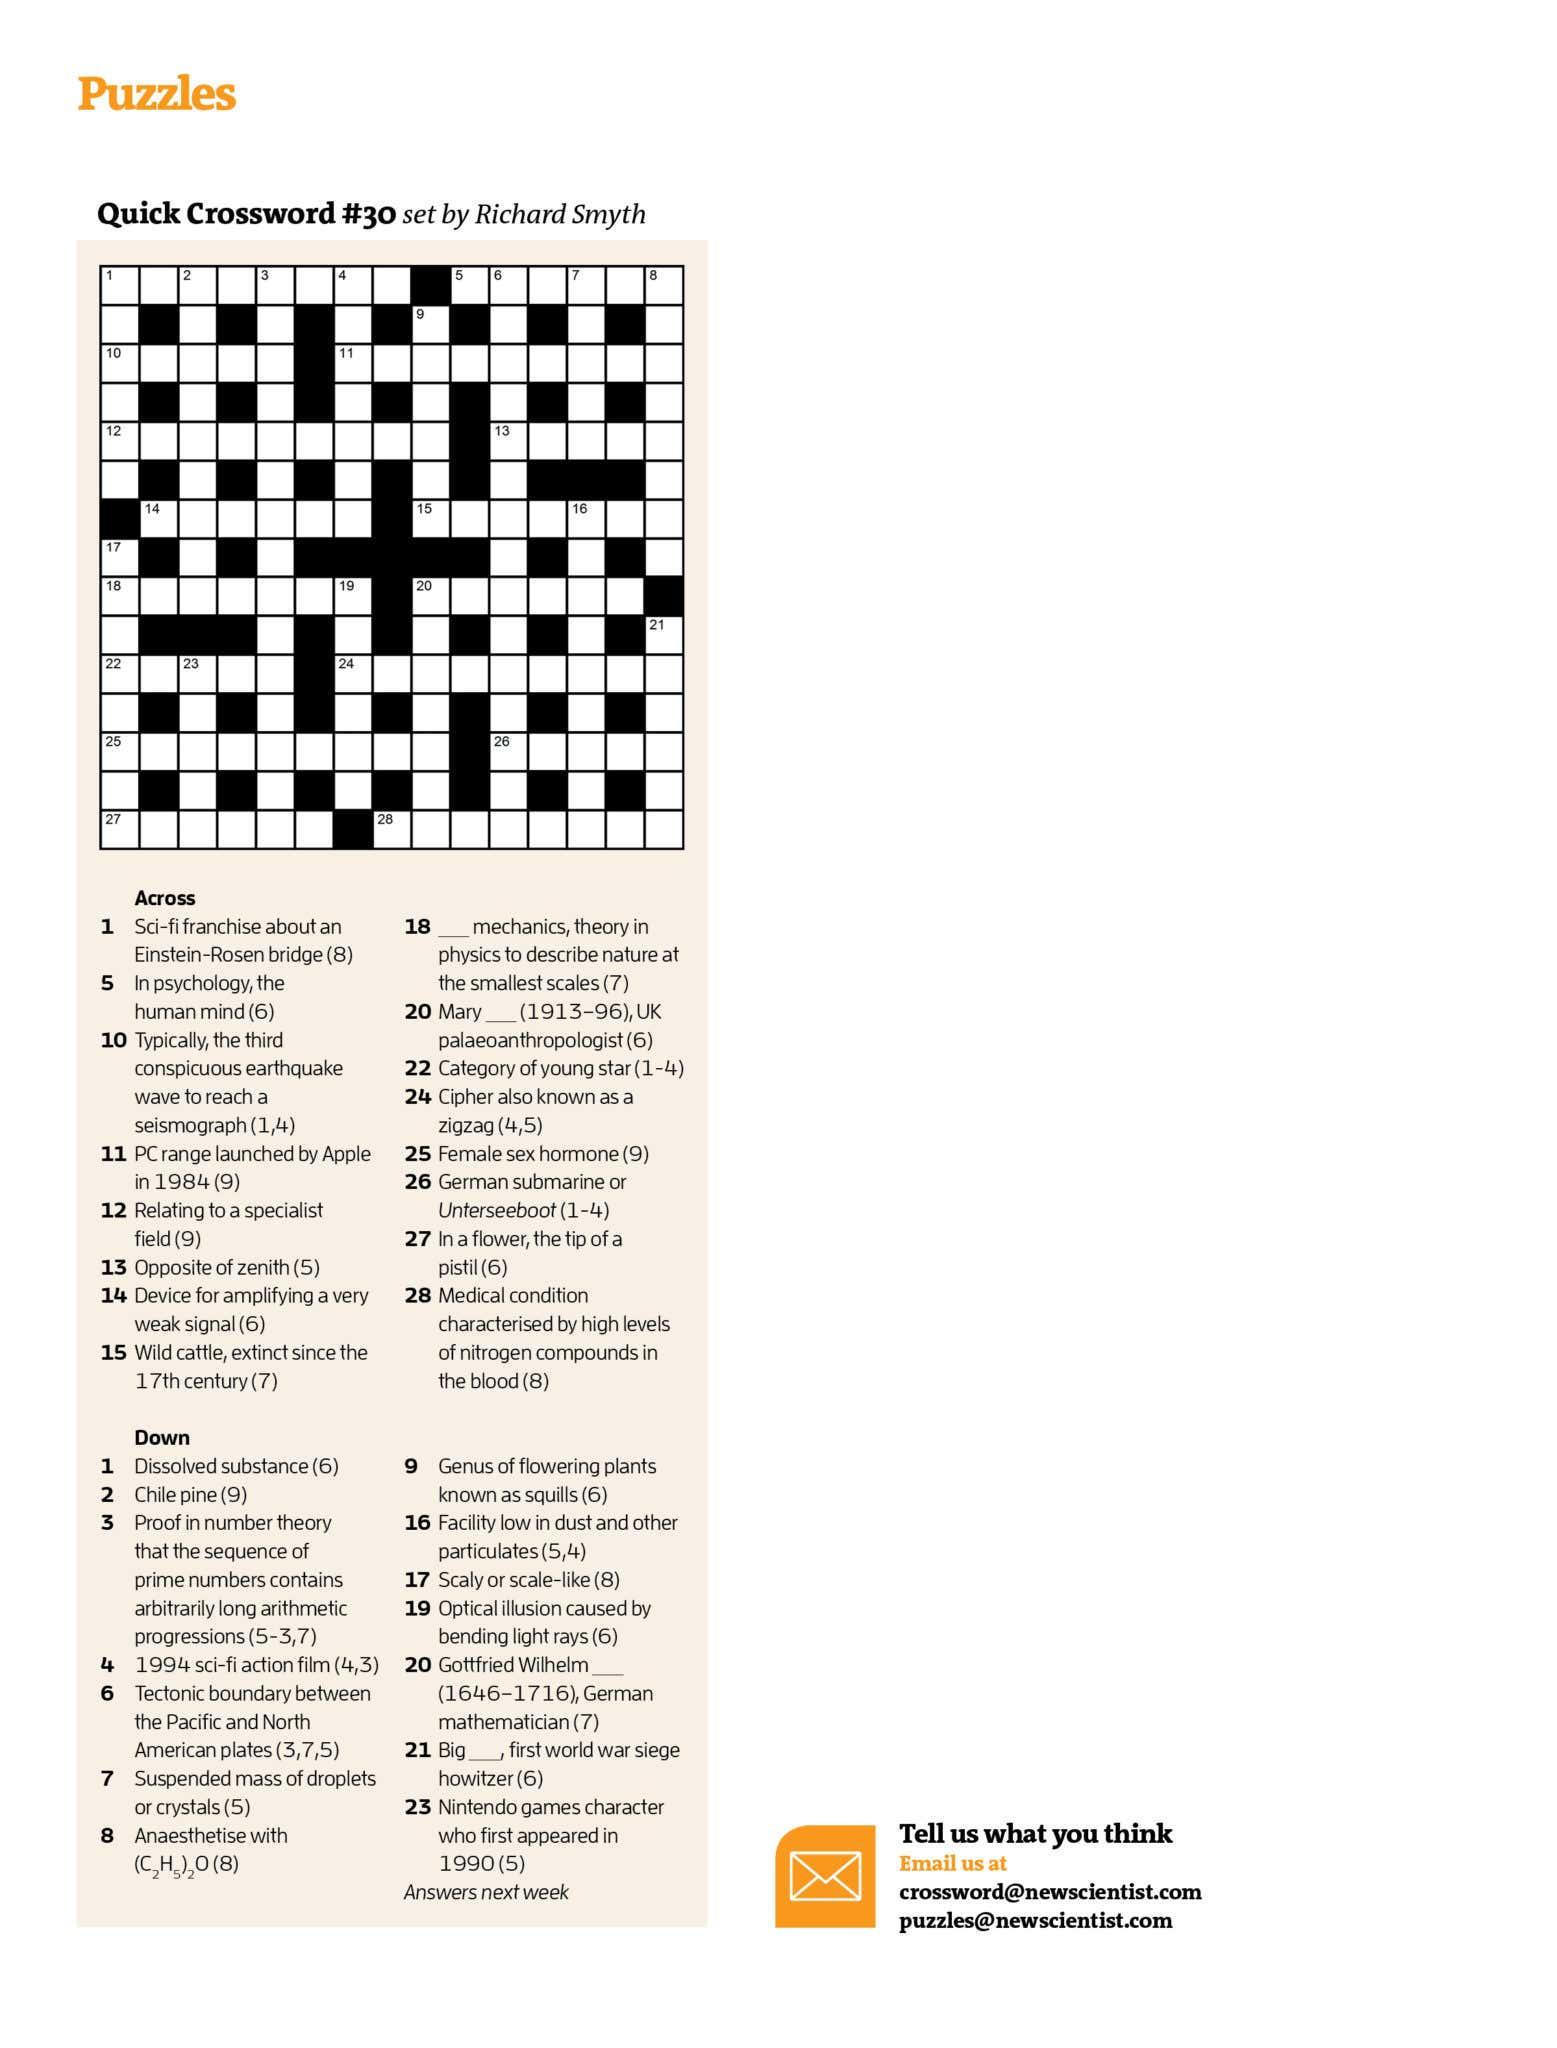 Quick Crossword #30 | New Scientist - Free Printable Quick Crossword Puzzles